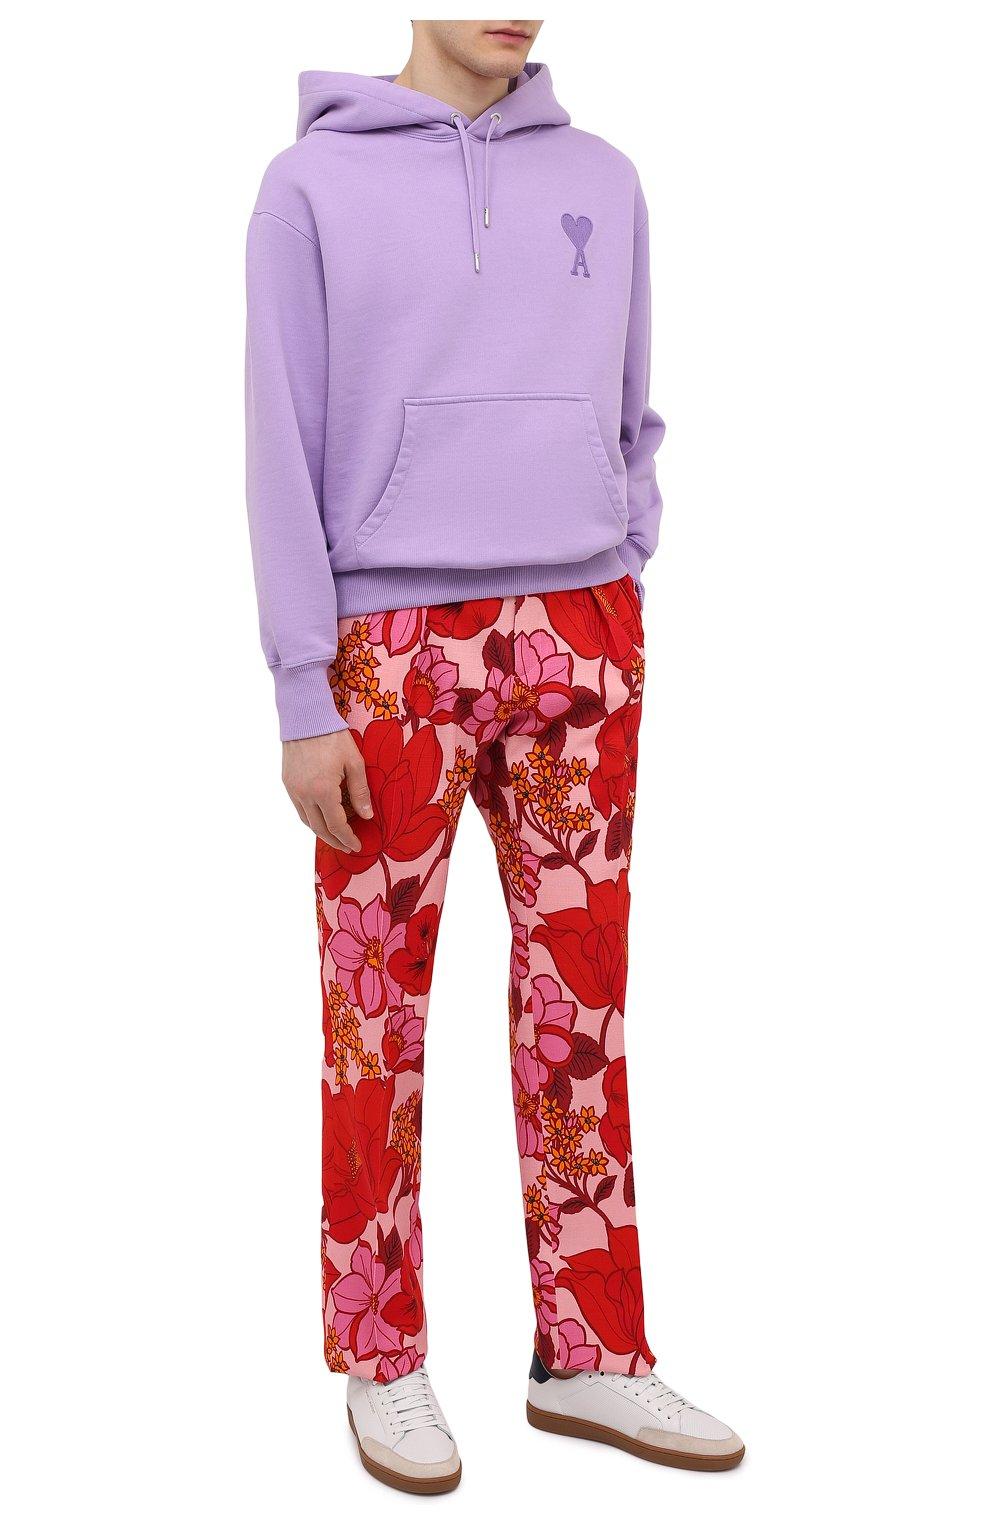 Мужские брюки из вискозы TOM FORD красного цвета, арт. 942R55/759F42 | Фото 2